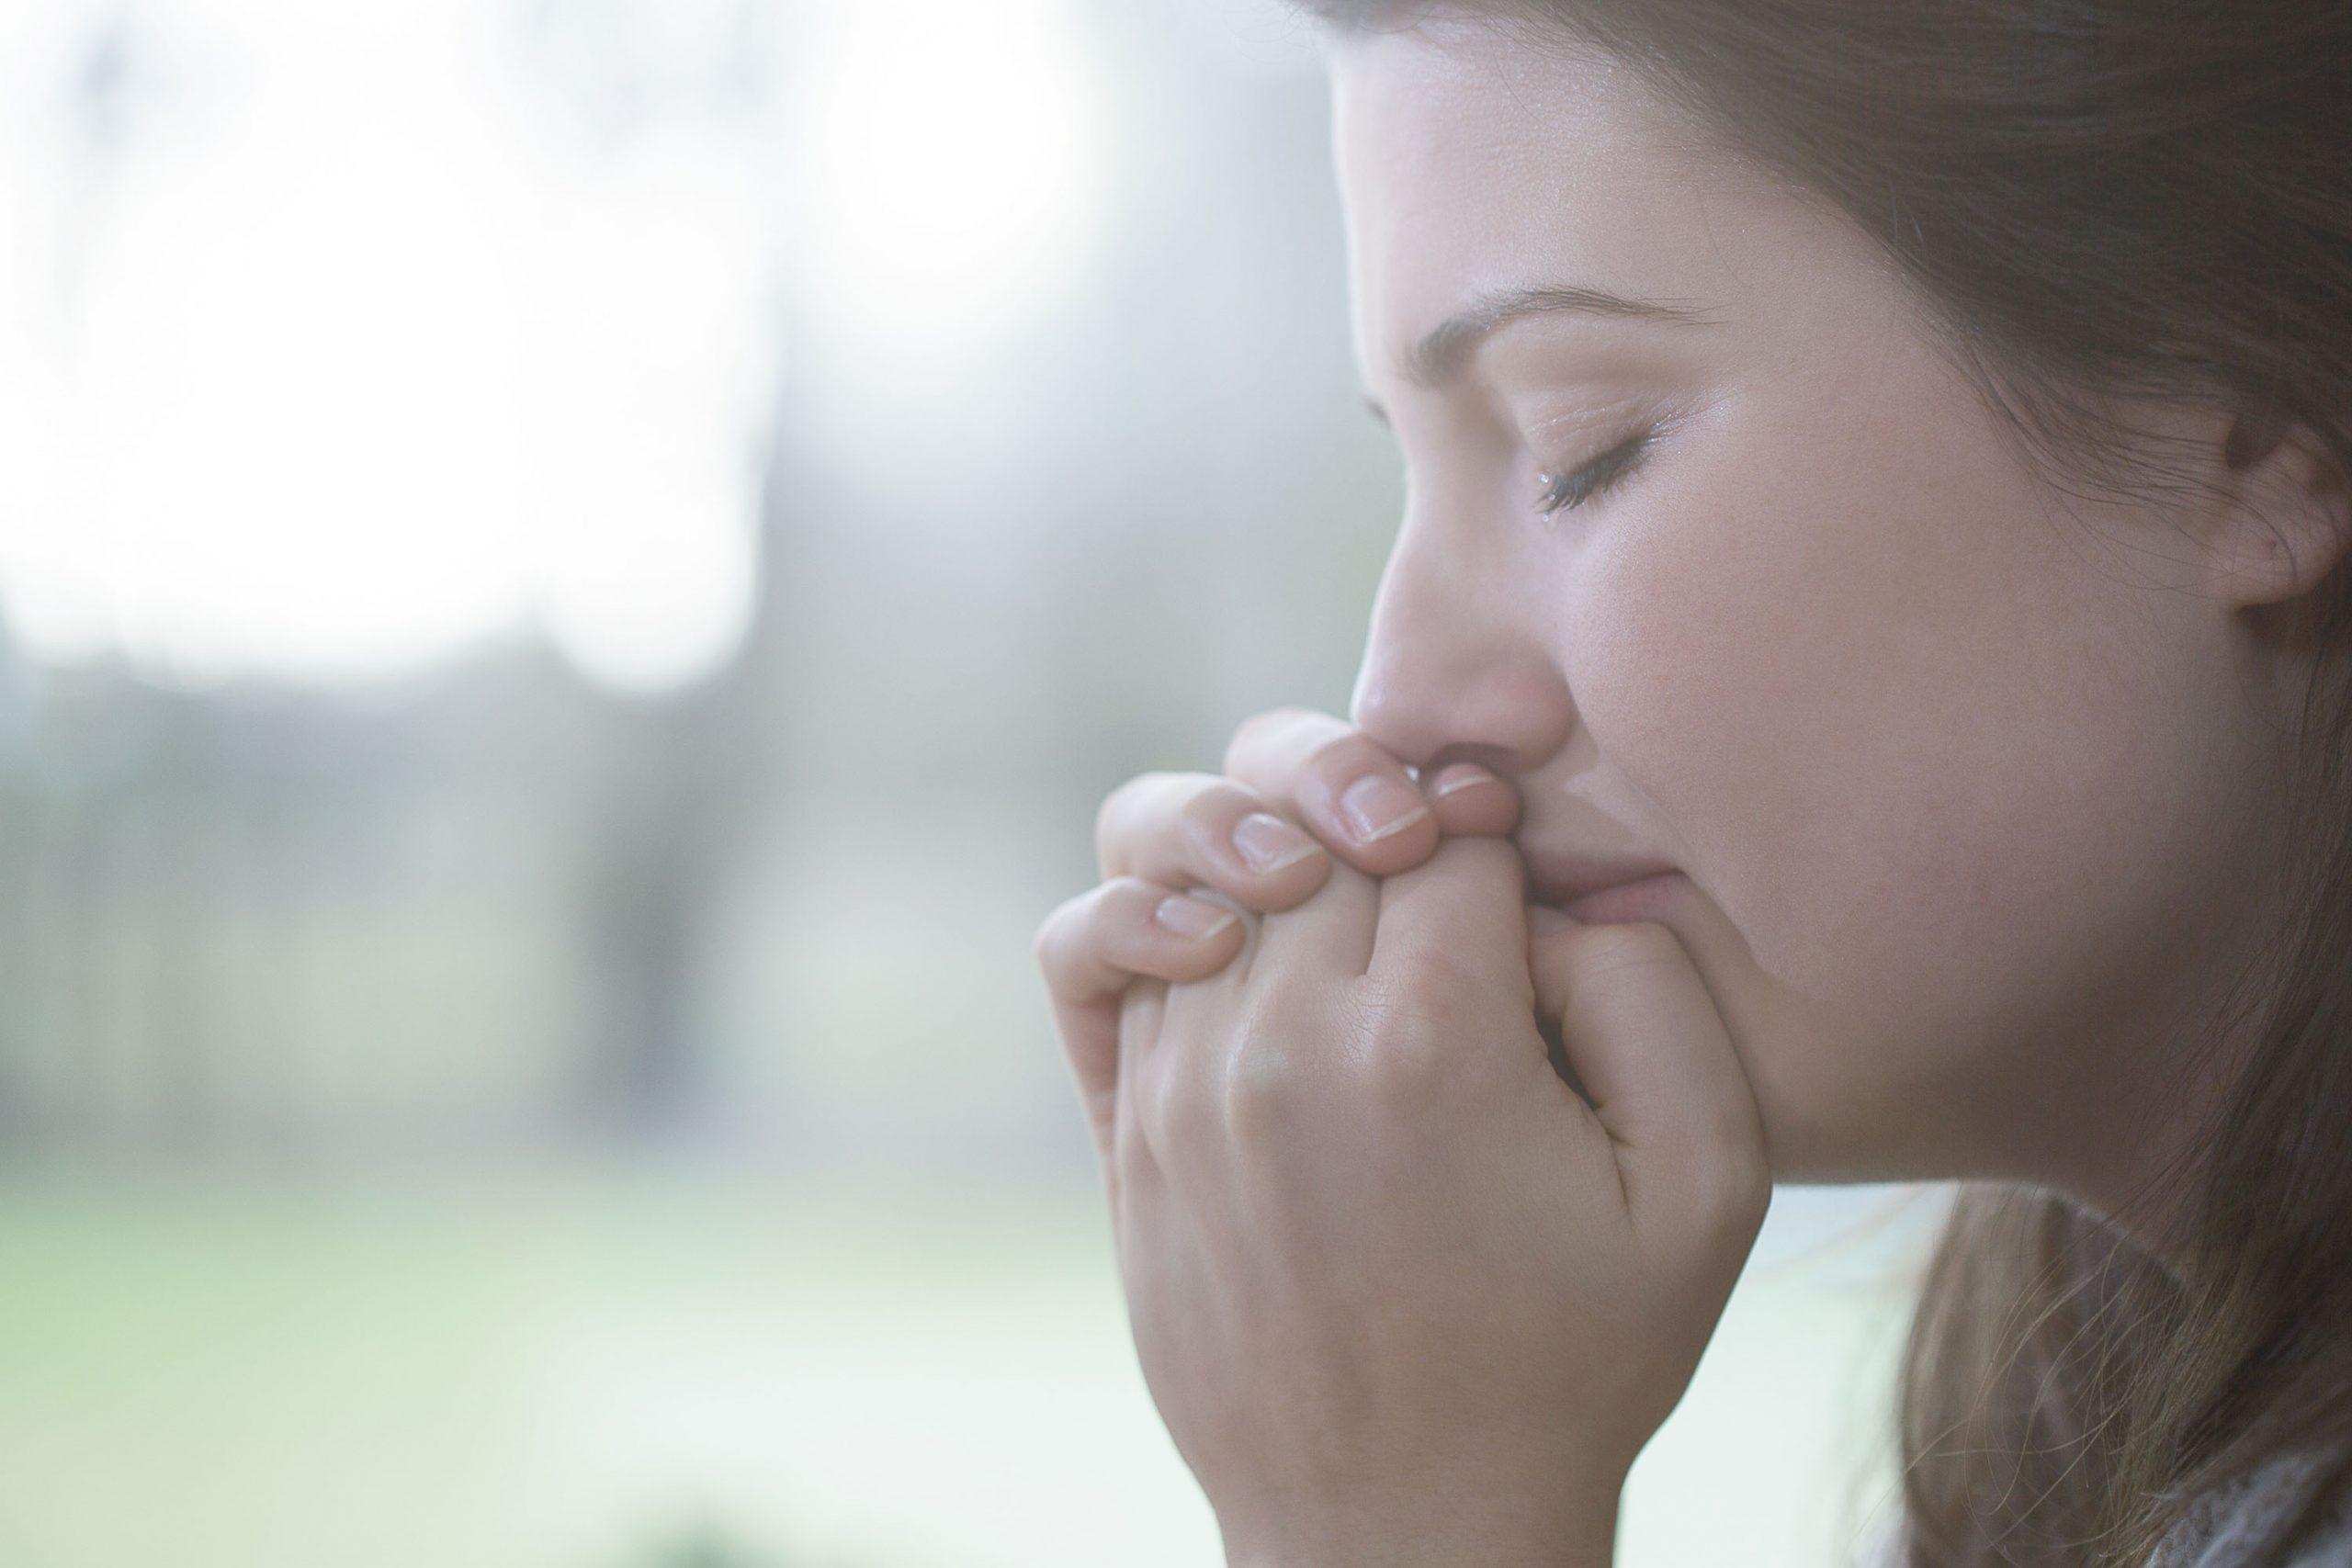 Stress, crisis and trauma